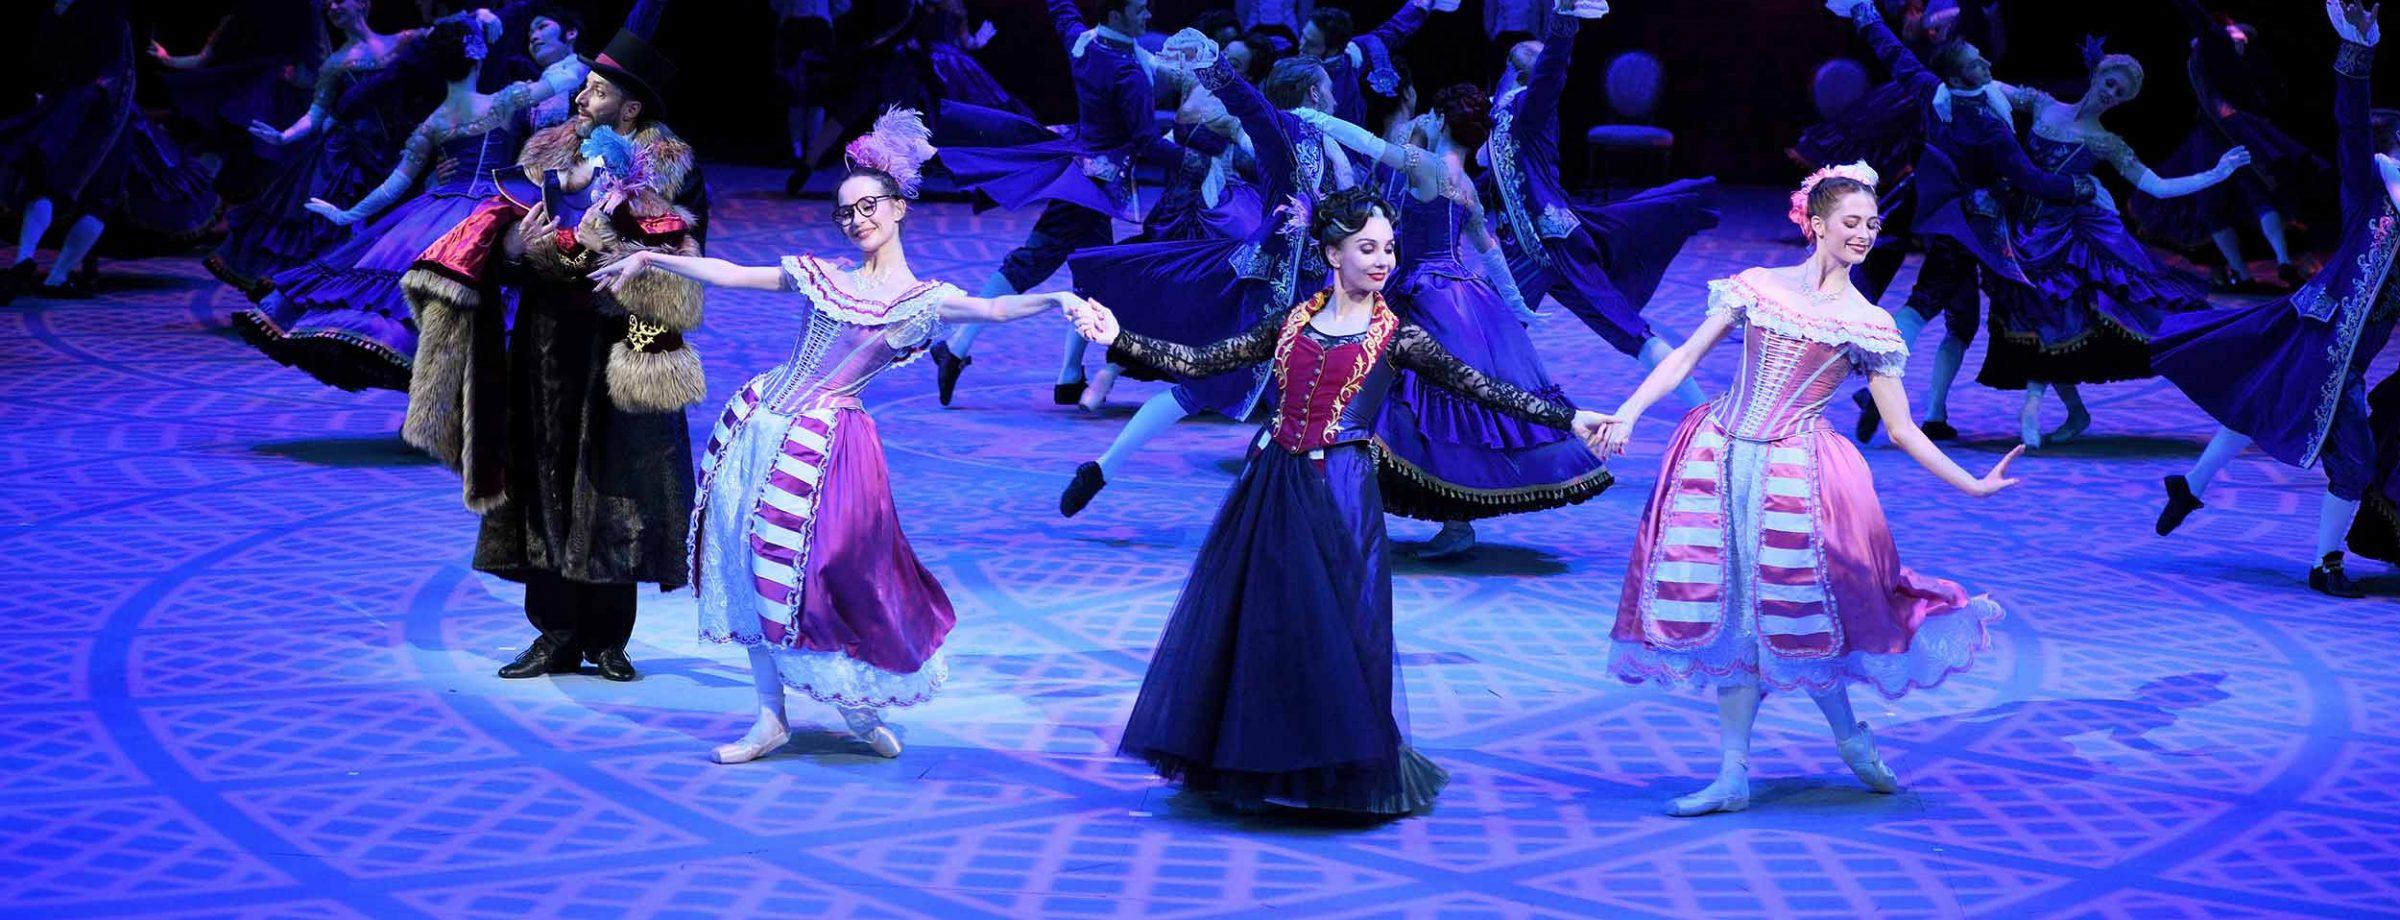 Katja Tamara and Emma in Cinderella in-the-round (c) Laurent Liotardo.